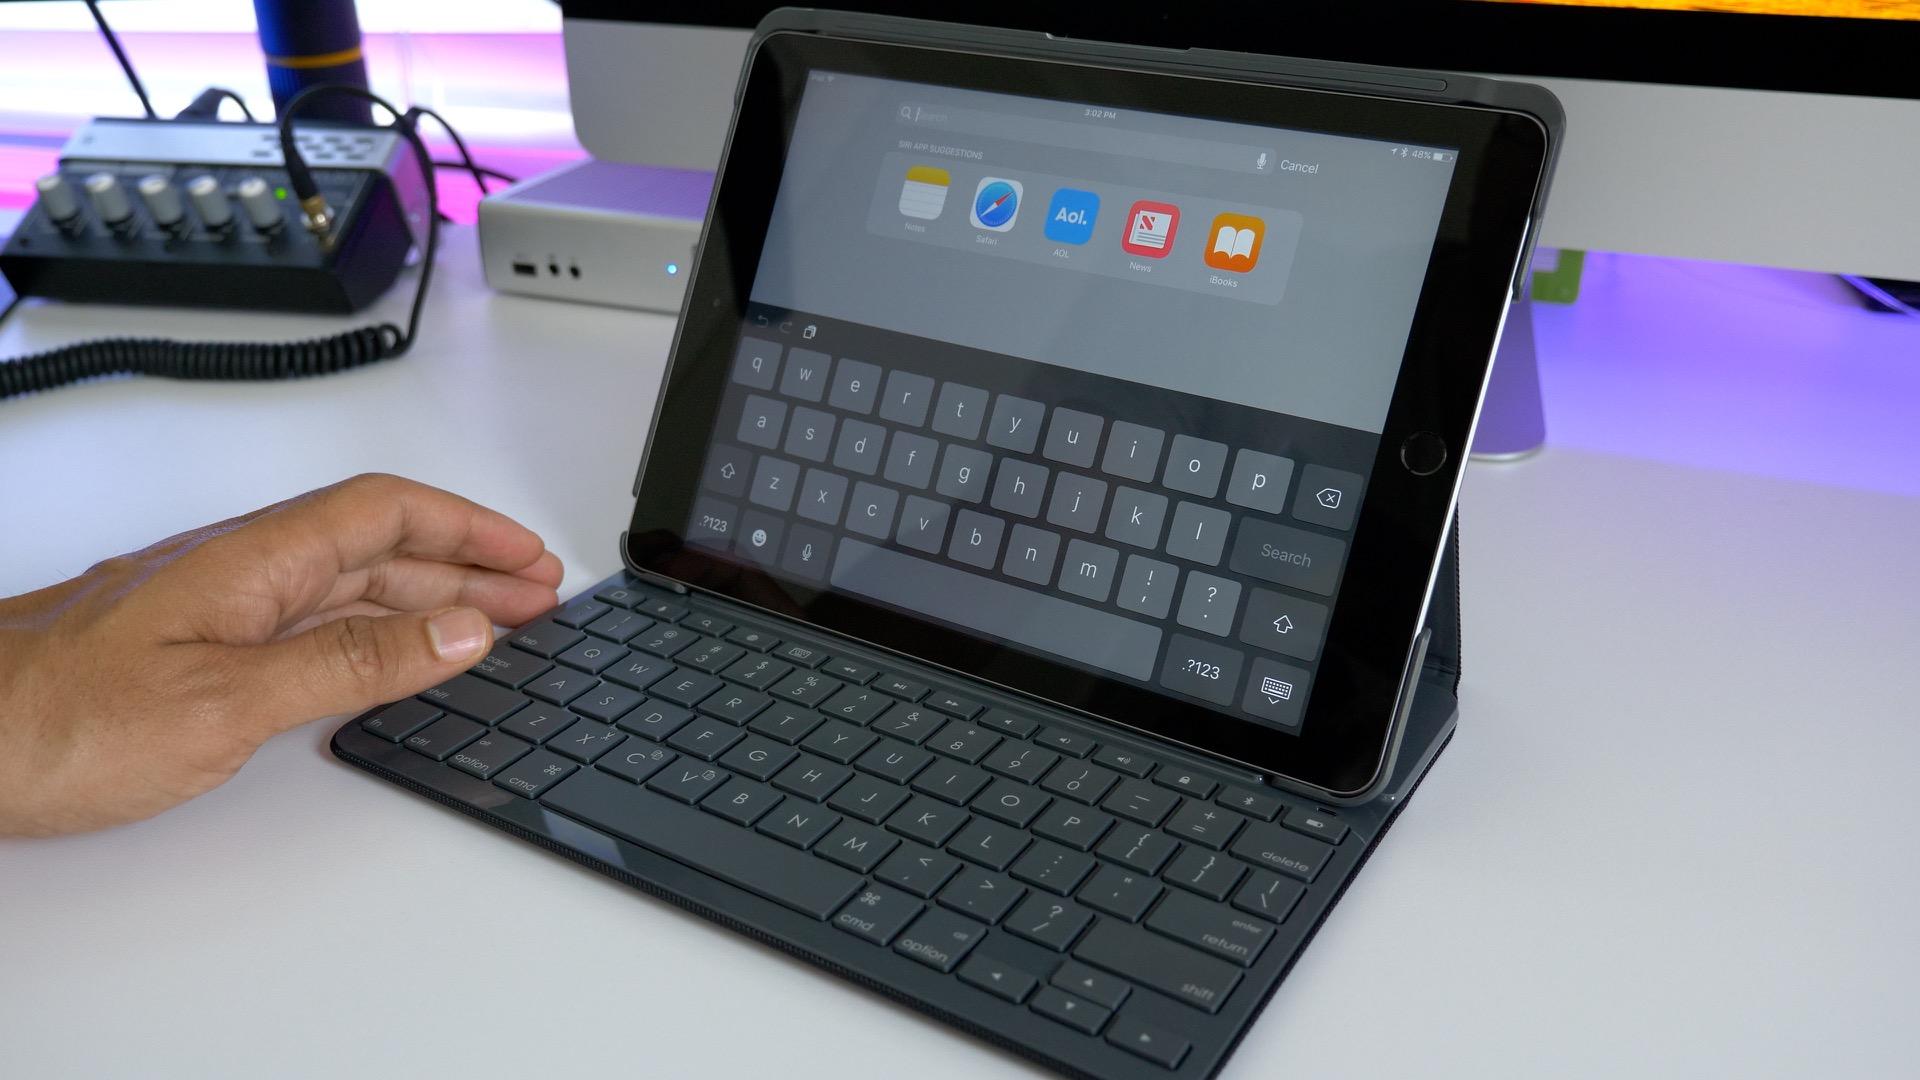 hands on logitech s slim folio keyboard case for 2017 ipad never rh 9to5mac com iPad Keyboard Charging Applie iPad Keyboard